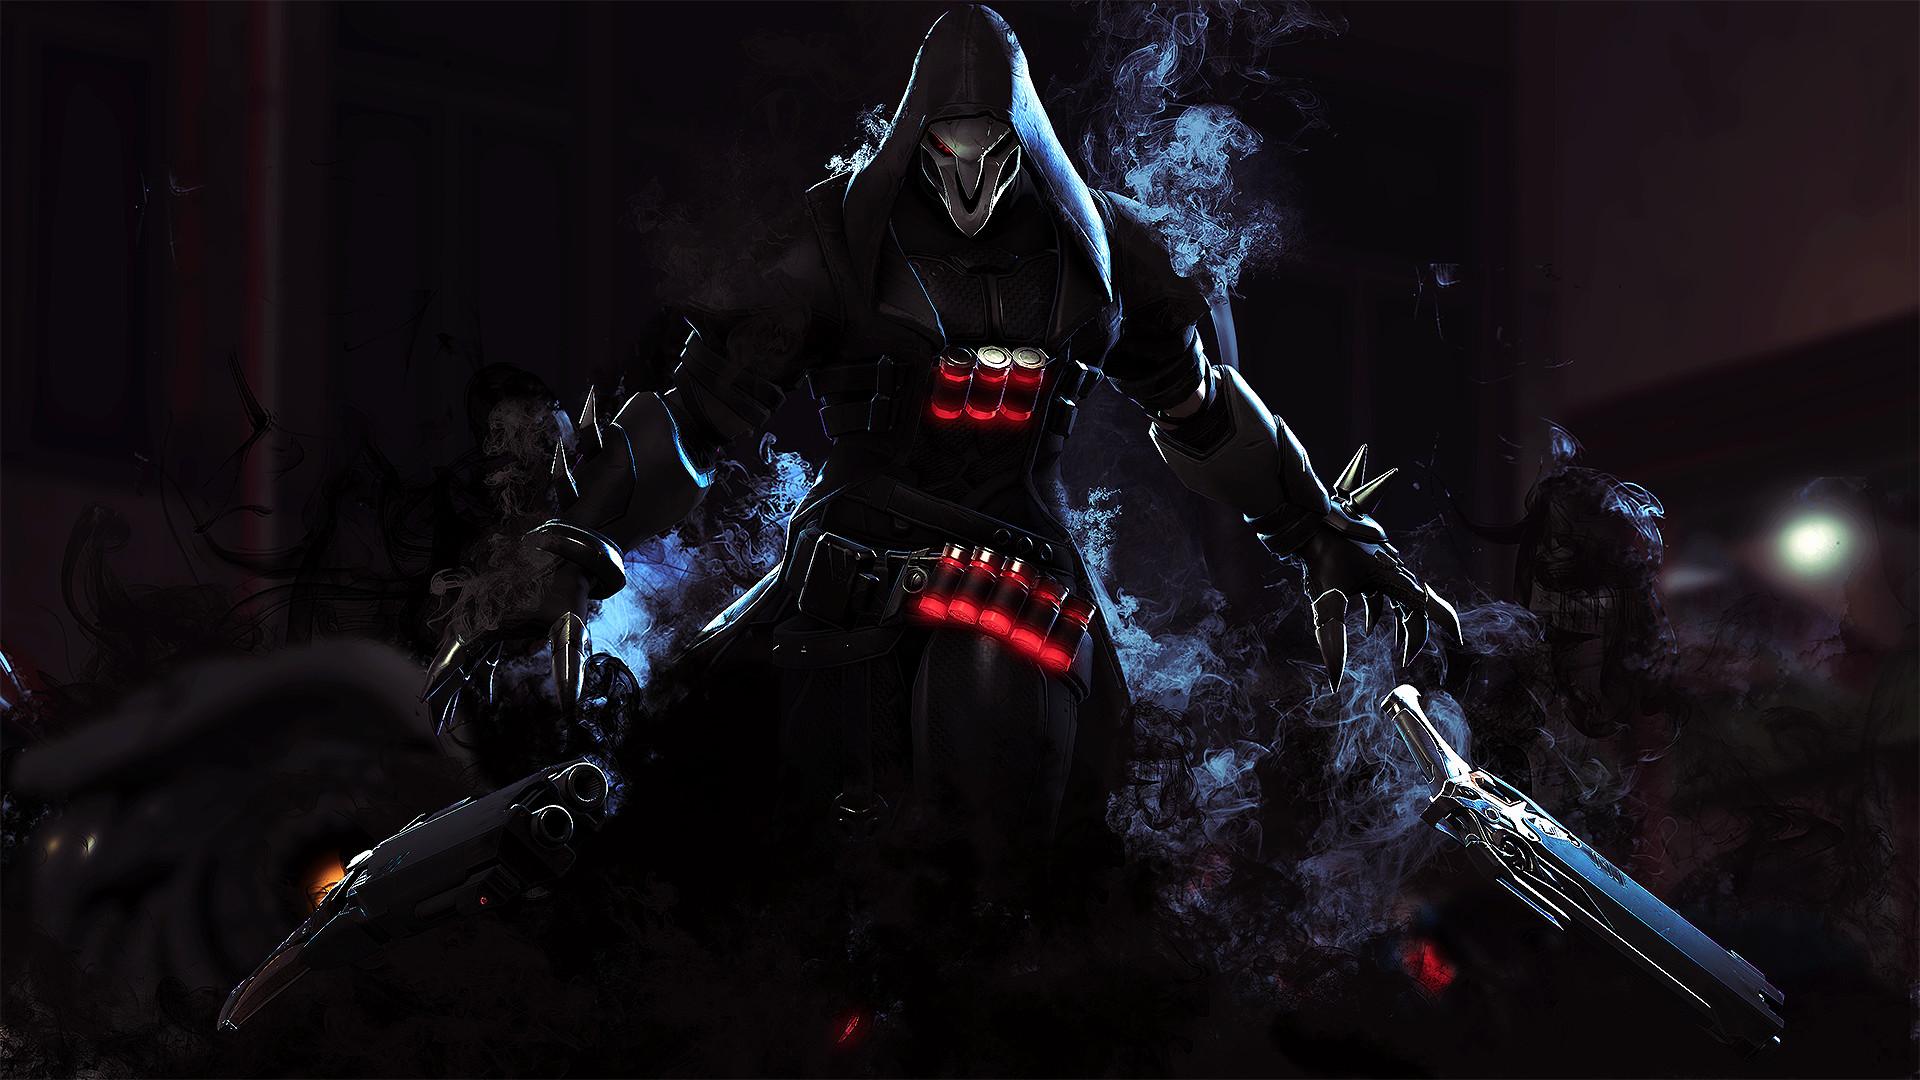 Reaper Overwatch Wallpapers (69+ pictures)